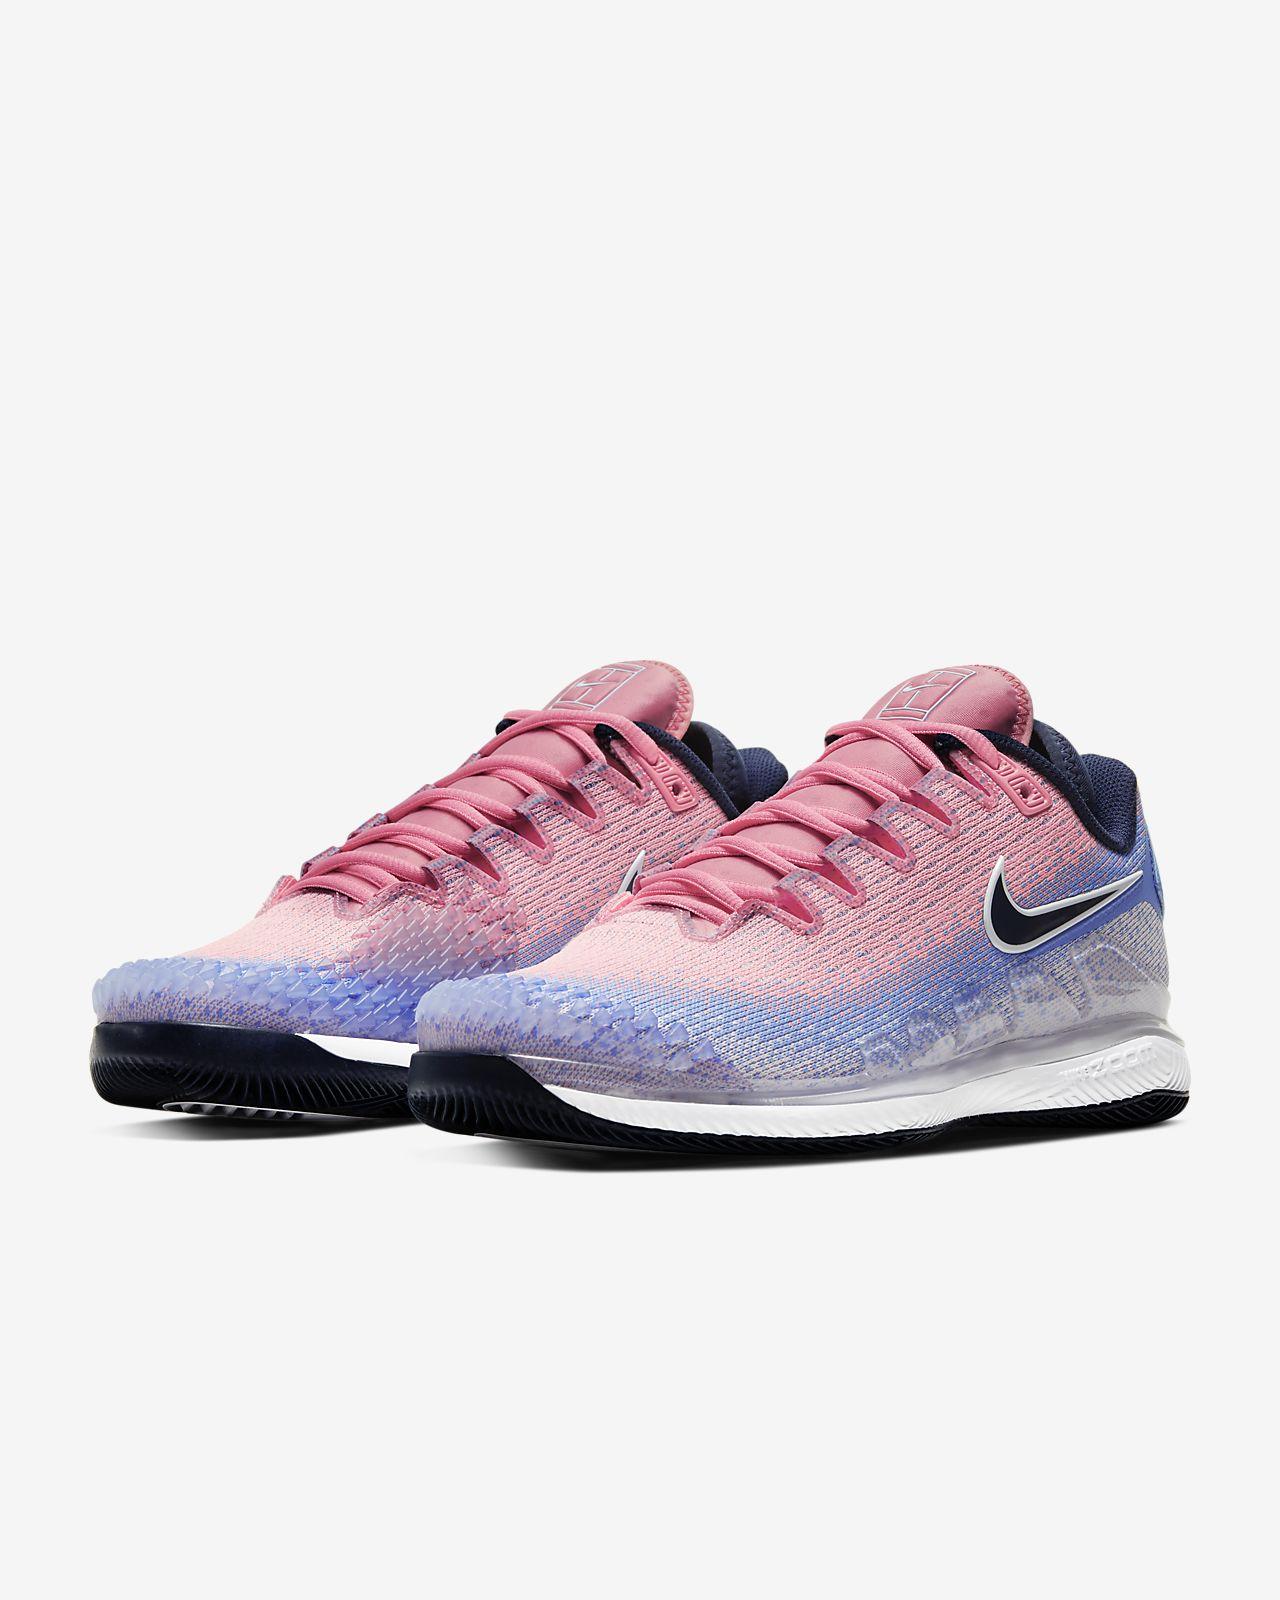 NikeCourt Air Zoom Vapor X Knit Women's